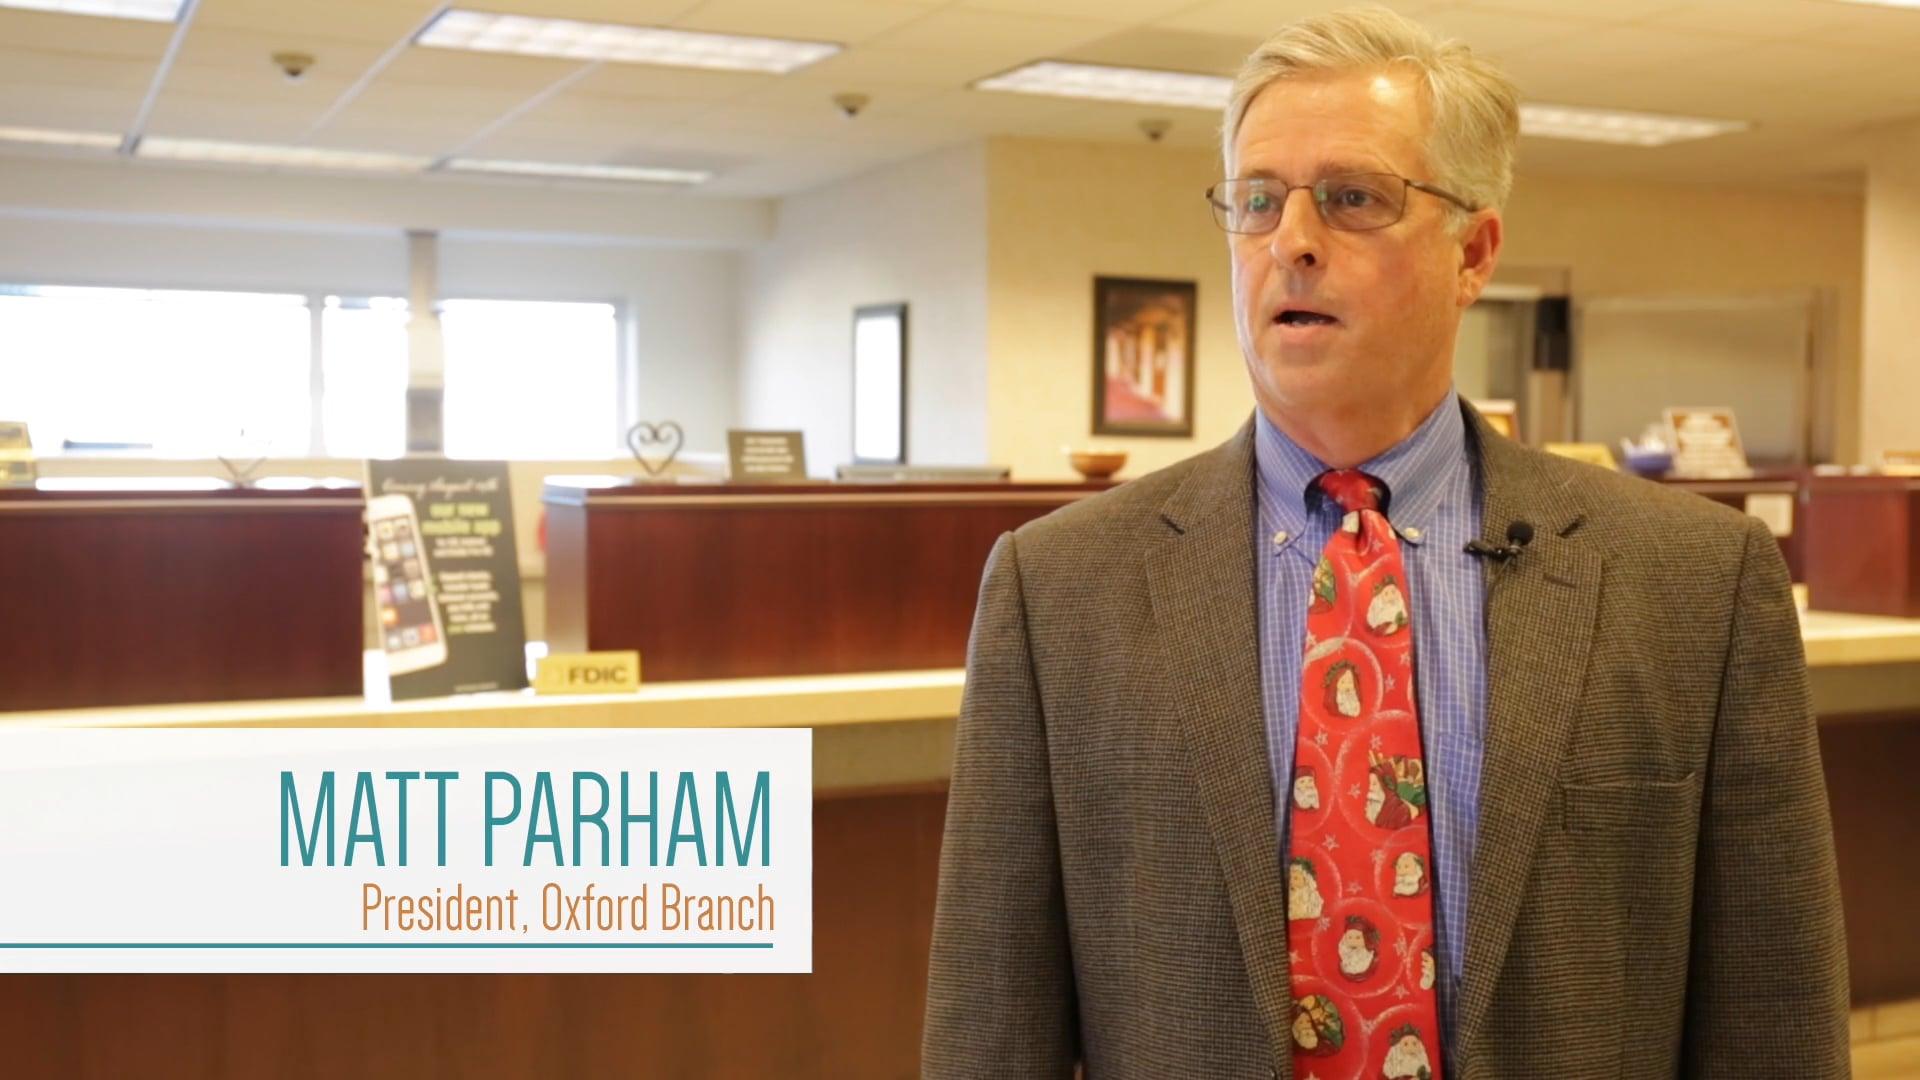 Meet Matt Parham, President at Bank of Commerce in Oxford, MS.